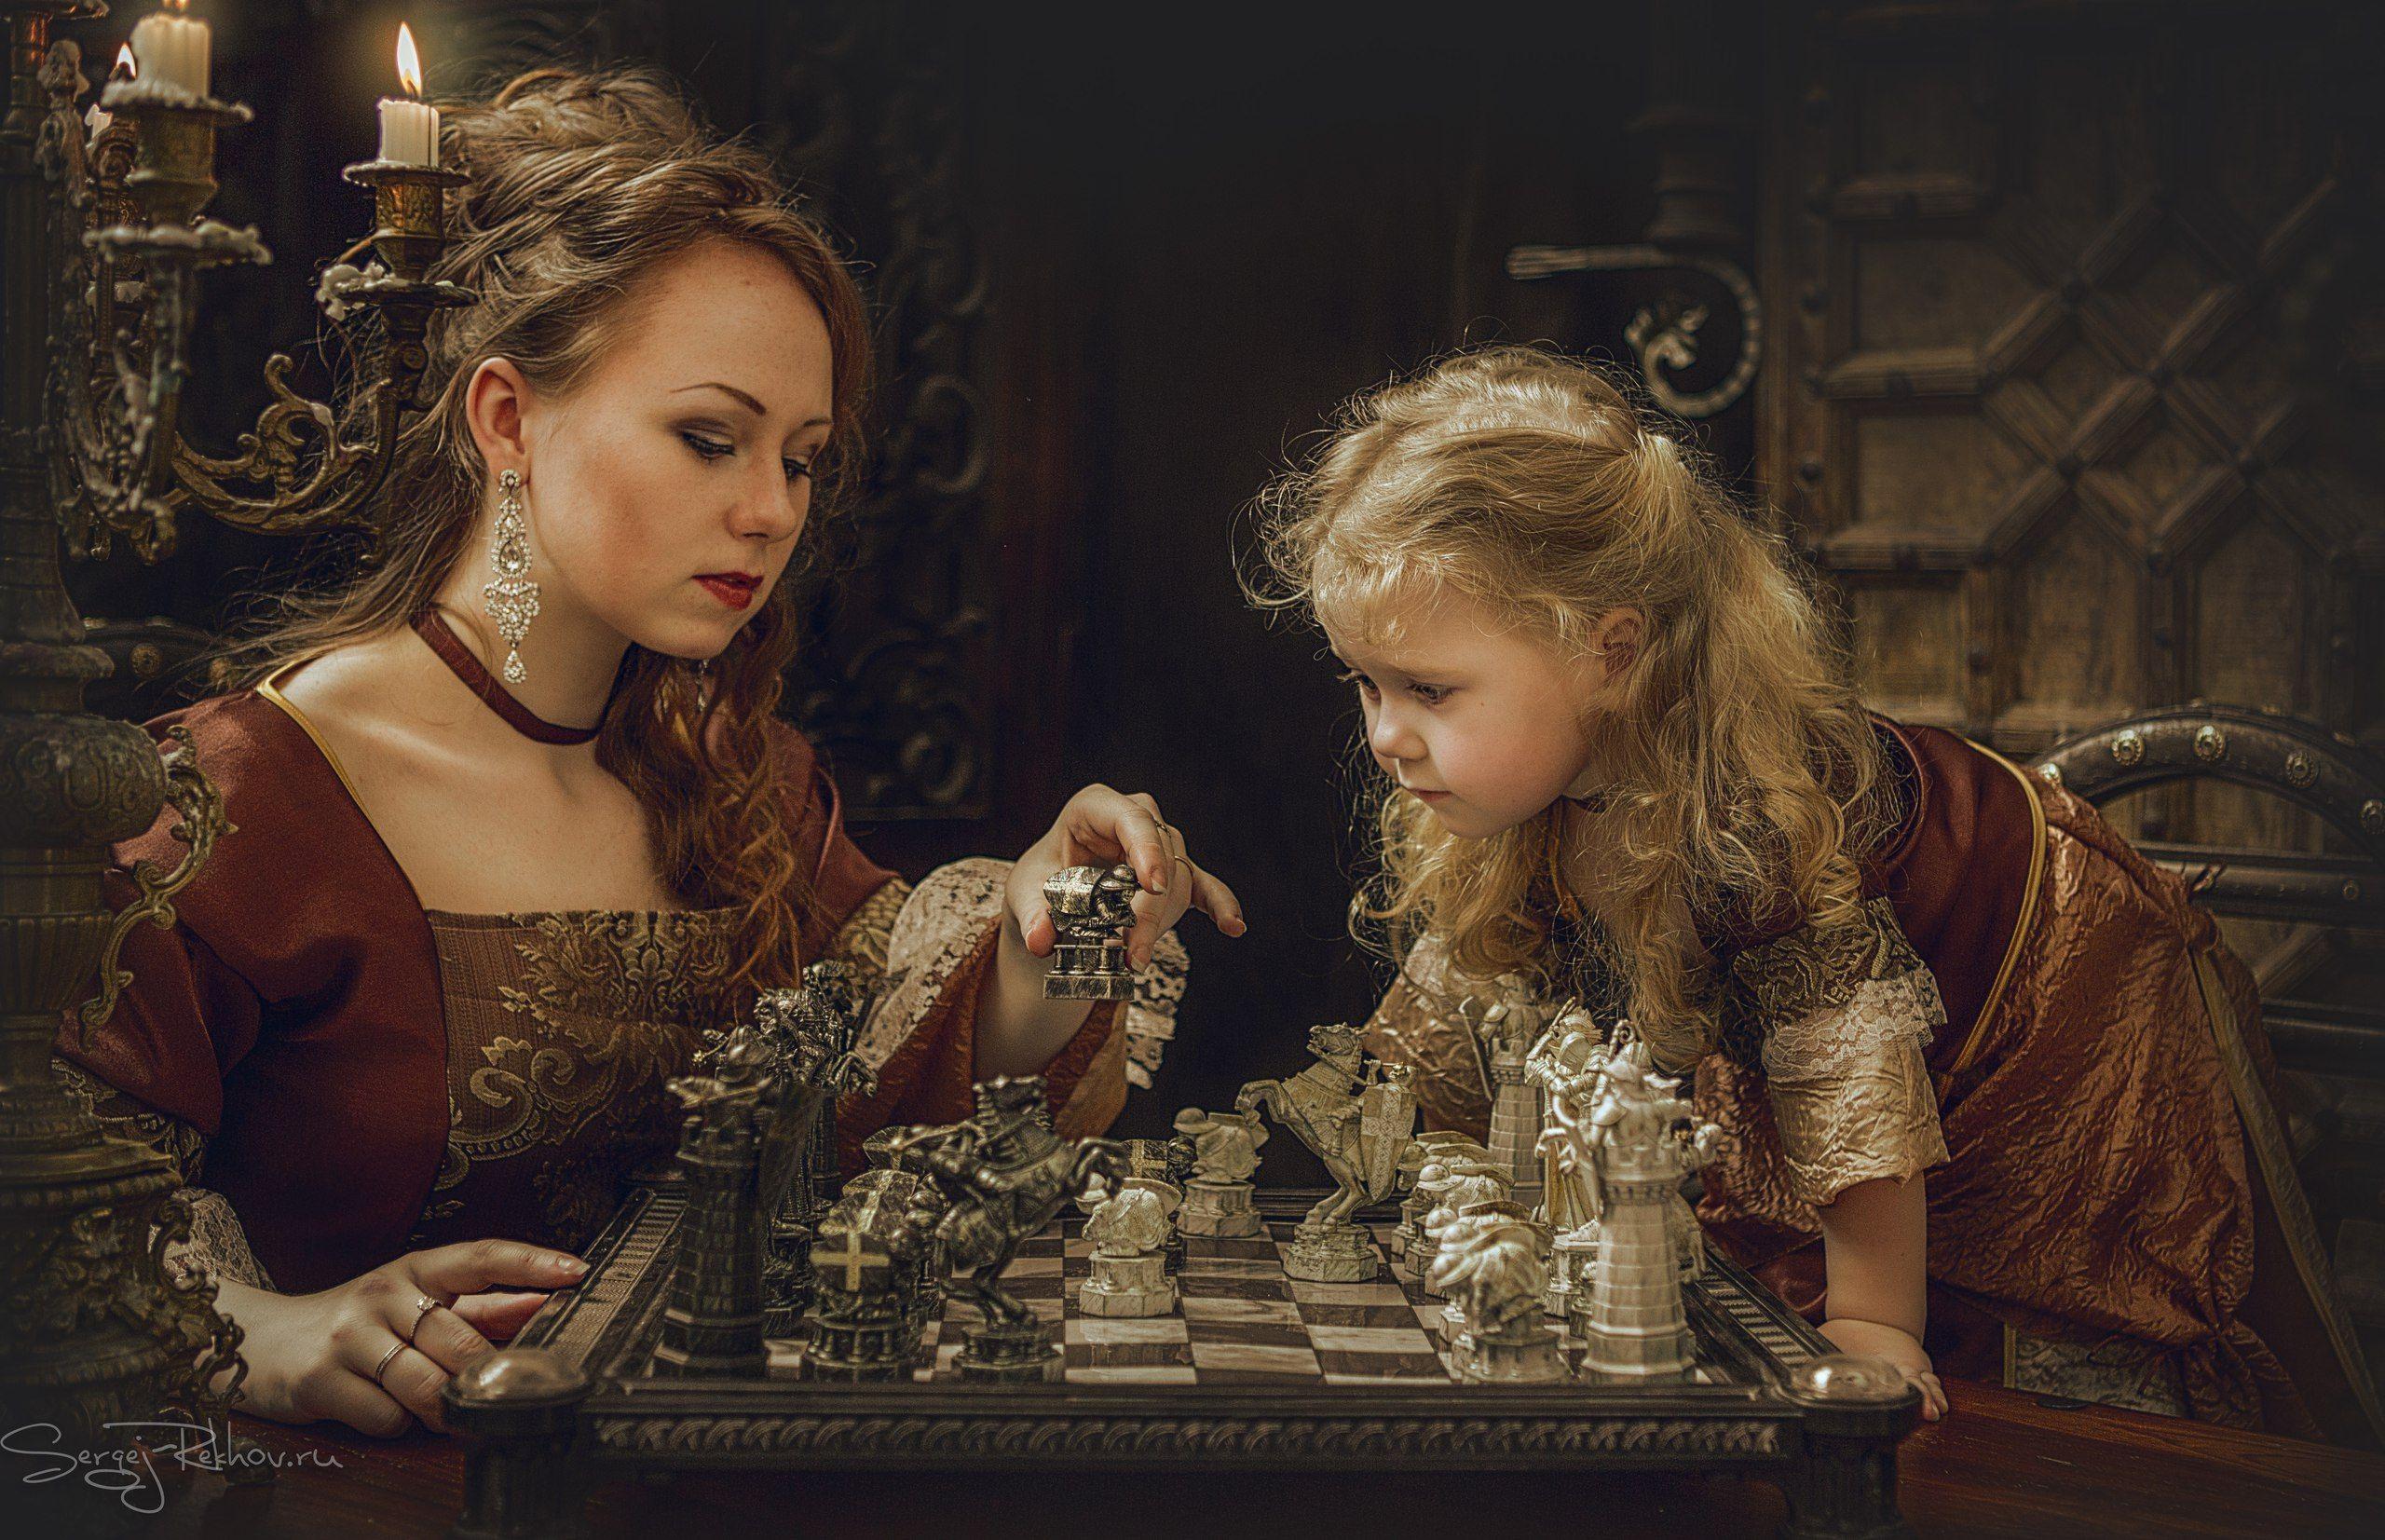 мама, шахматы, дочка, игра, rekhov, Сергей Рехов